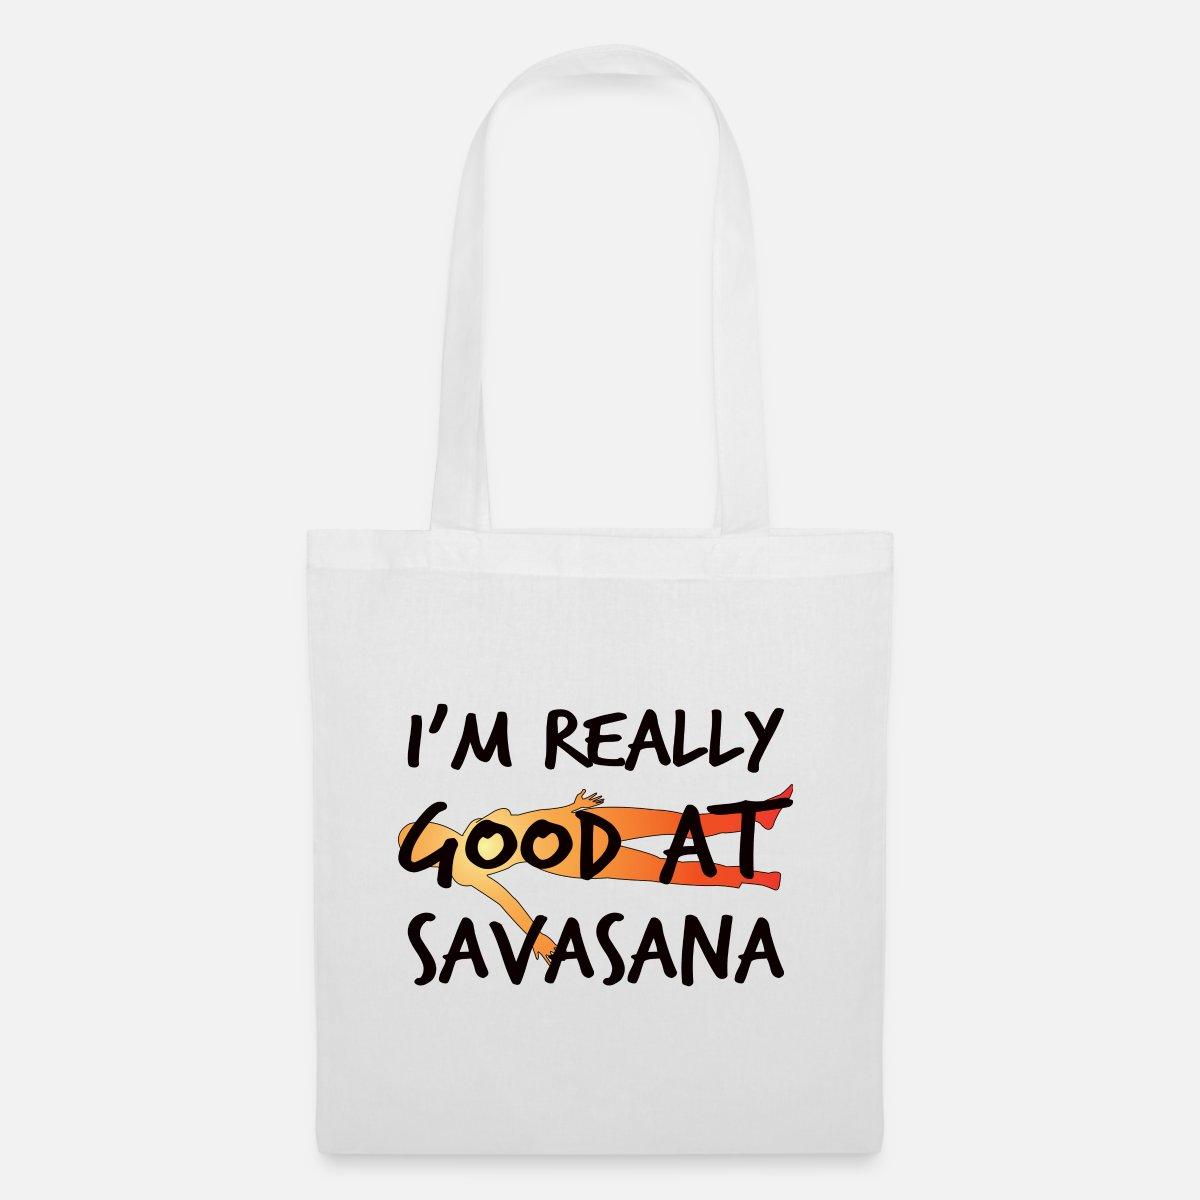 Savasana Yoga Karma Sport Yogi Namaste' Stoffbeutel   Spreadshirt